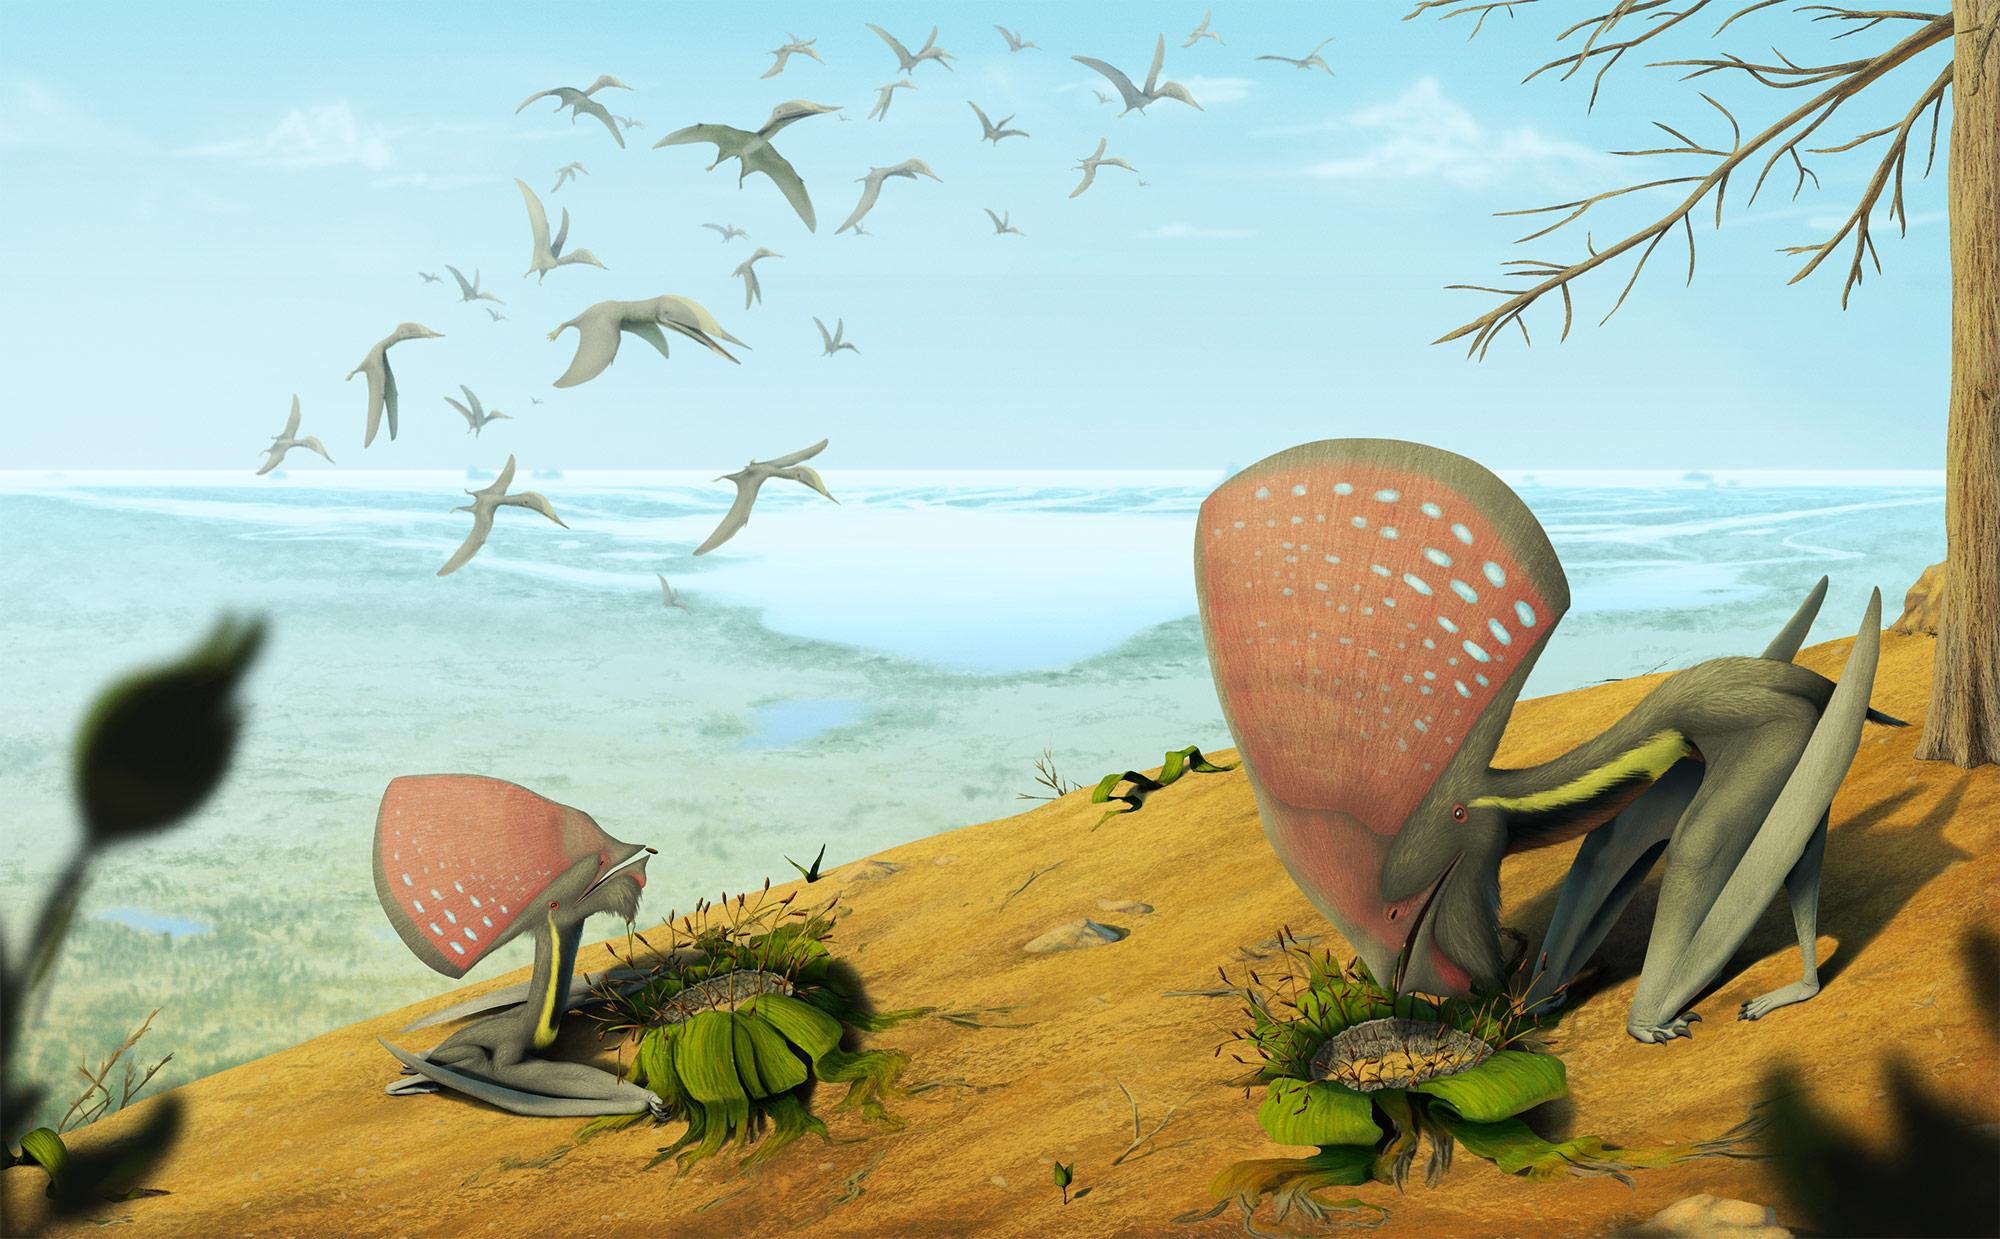 a_crato-formacio_pteroszauruszai_vitor_silva.jpg